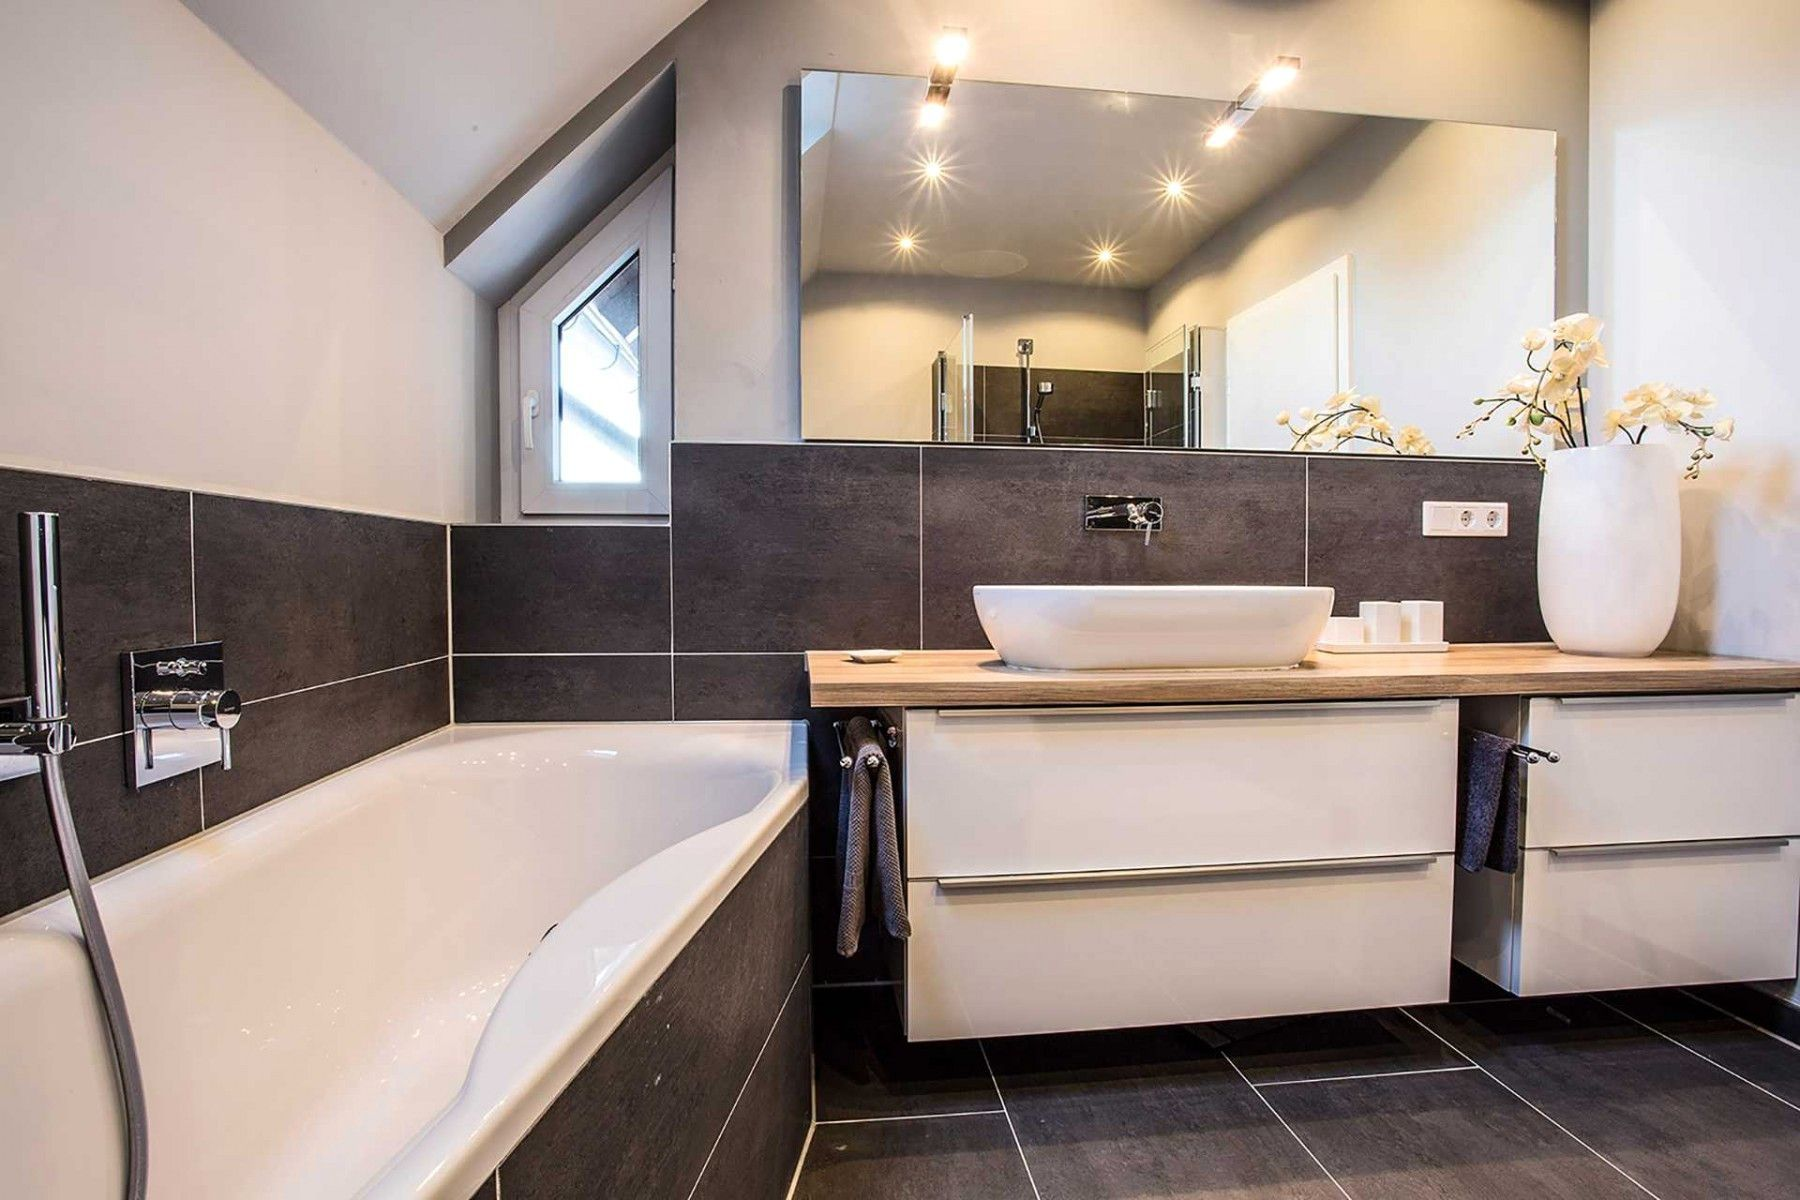 8 Badezimmer Grau Weiss Holz Badezimmer Badezimmer Badezimmer Eintagamsee Bathroom Layout Main Bathroom Ideas Wood Bathroom